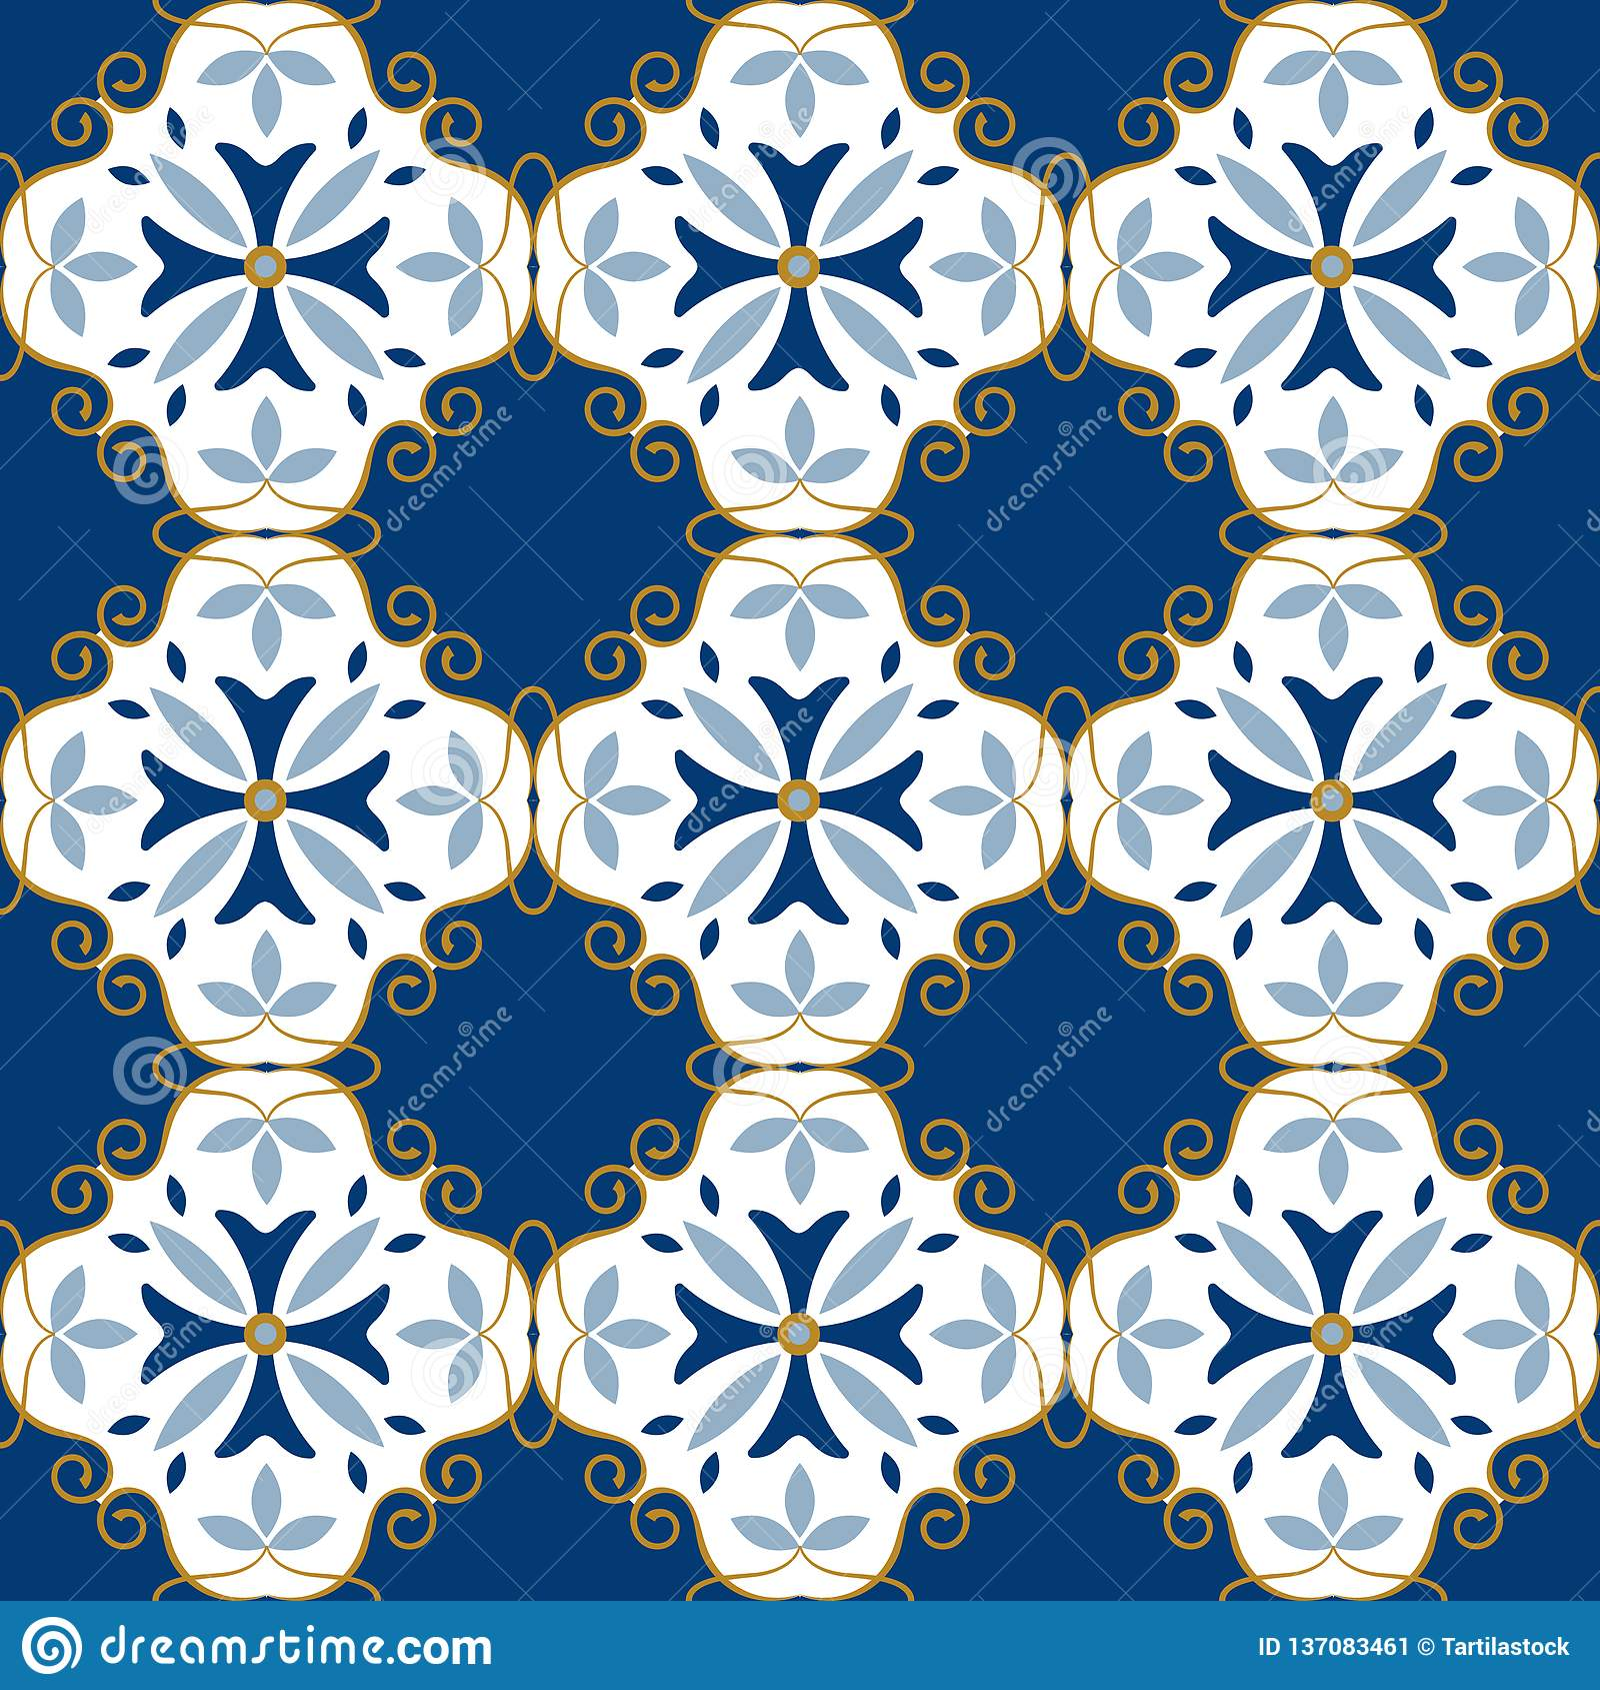 Moroccan Pattern Decor Tile Texture Tiling Seamless Pattern Stock Vector Illustration Of Ornamental Ceramic 137083461